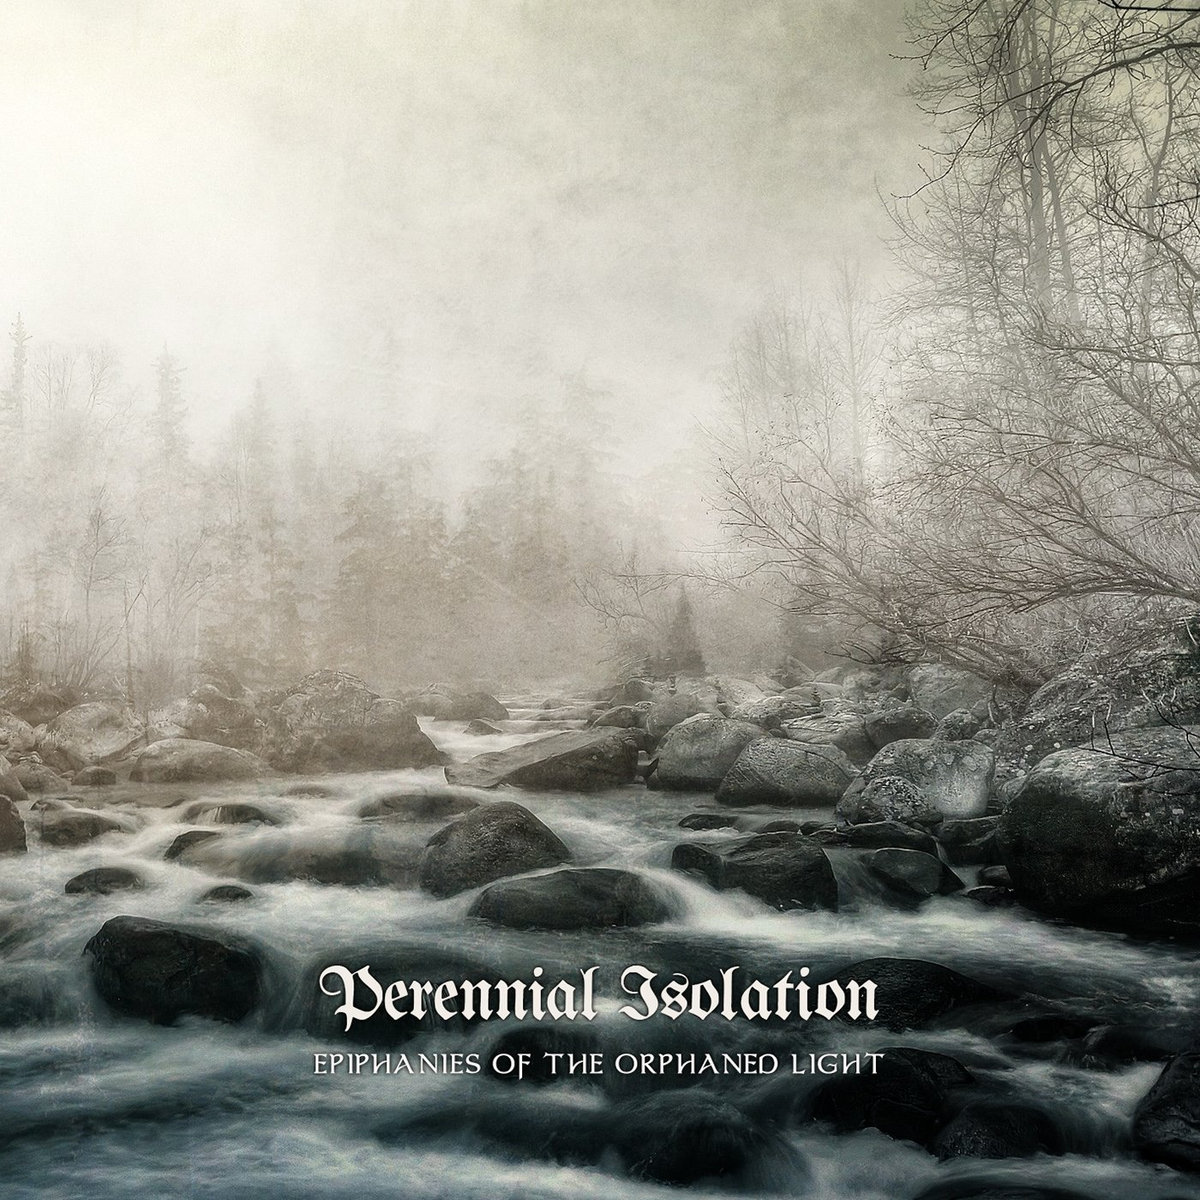 perennial isolation